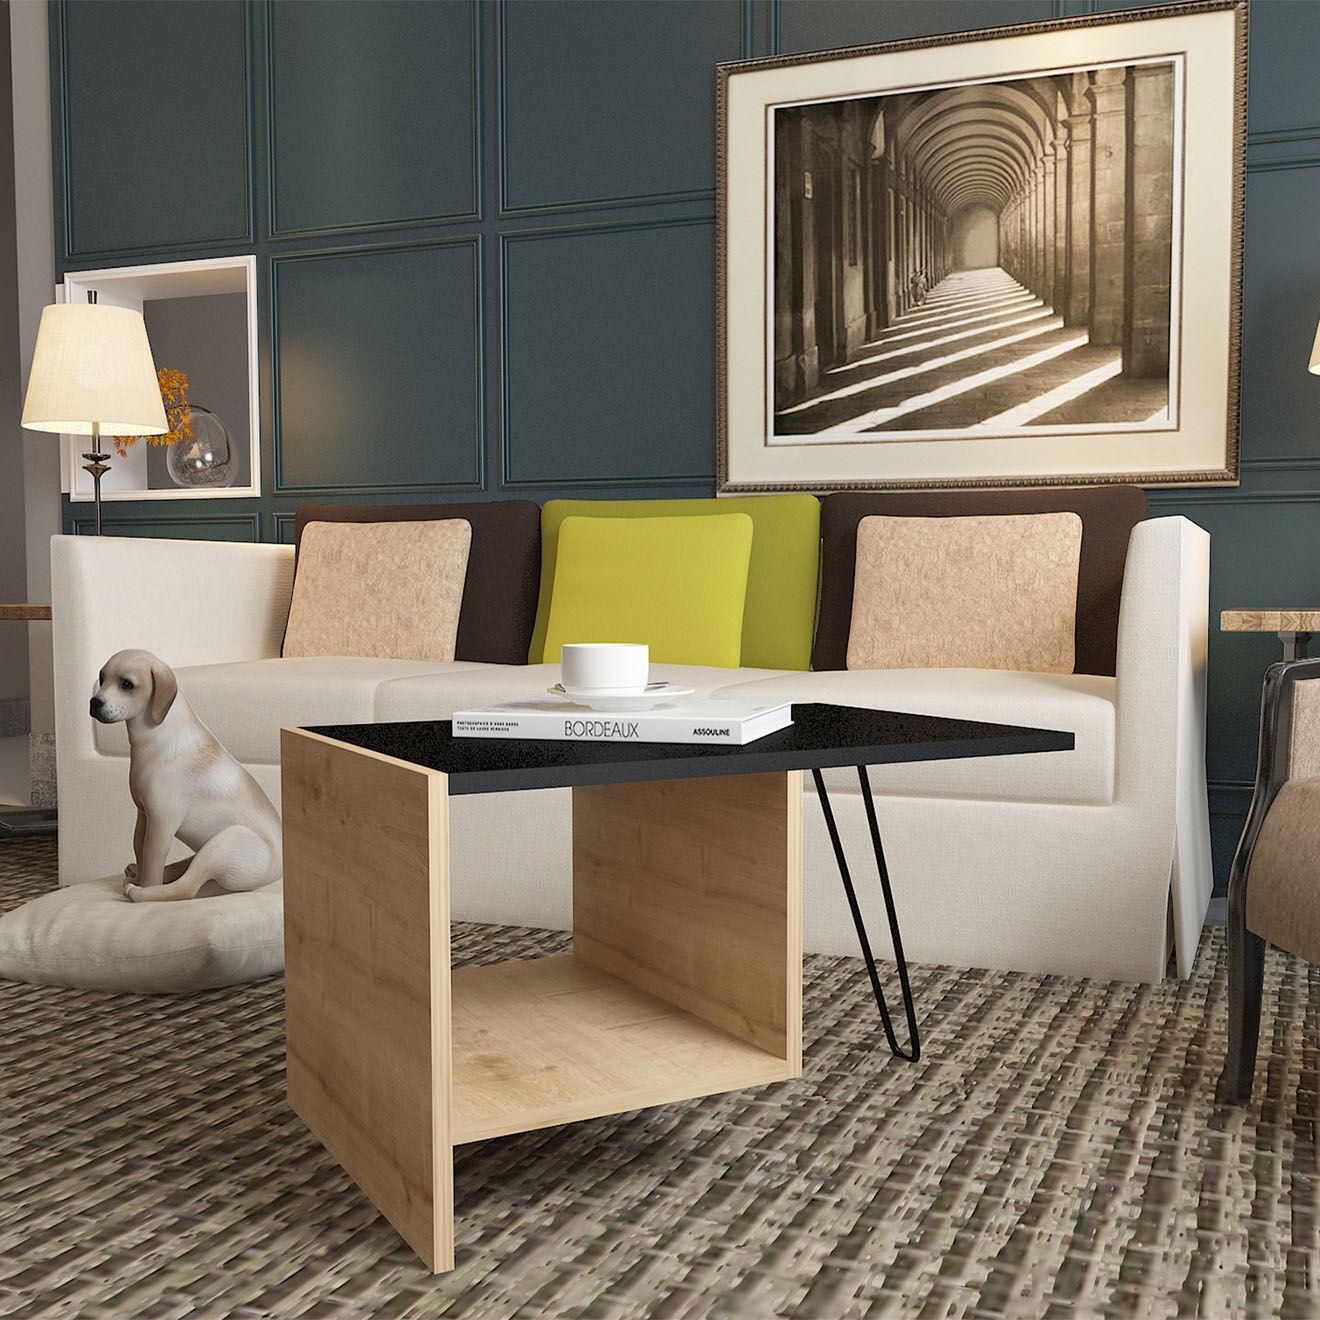 Table basse Loop chêne/noir - 71.8x50x45 cm